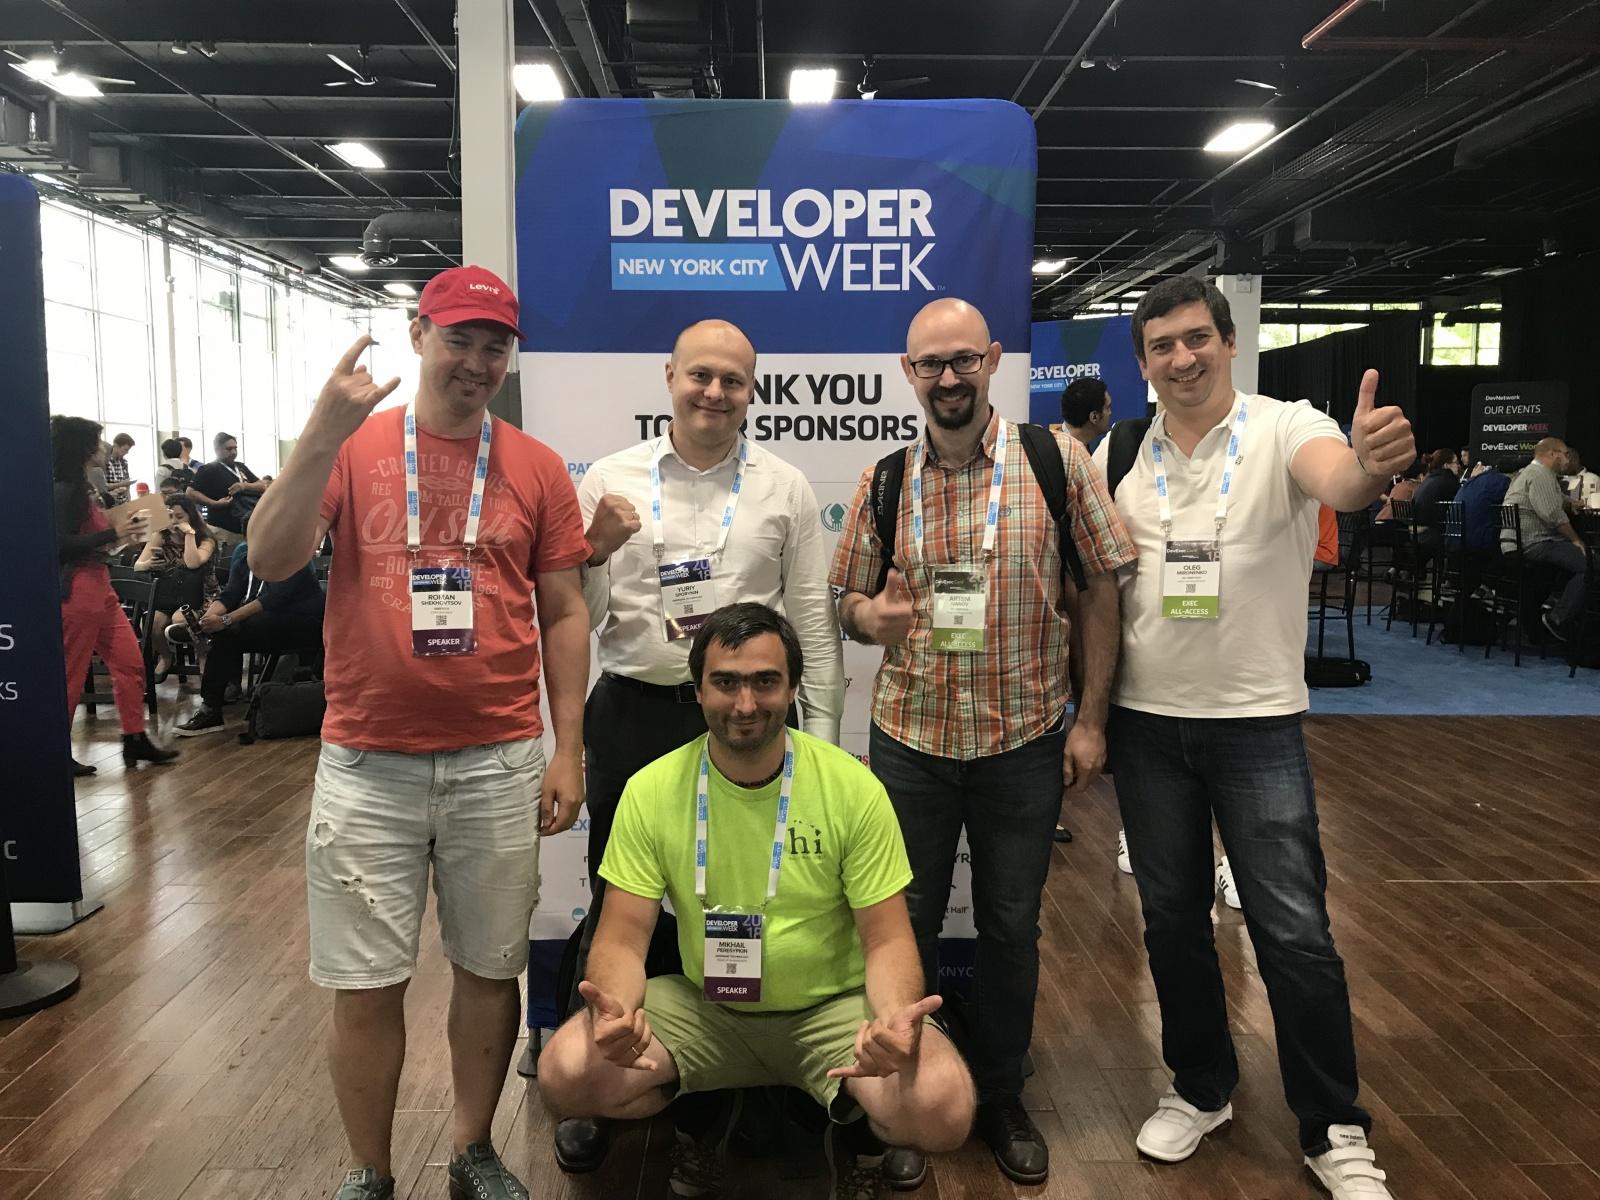 Как мы съездили на New York Developer Week - 9